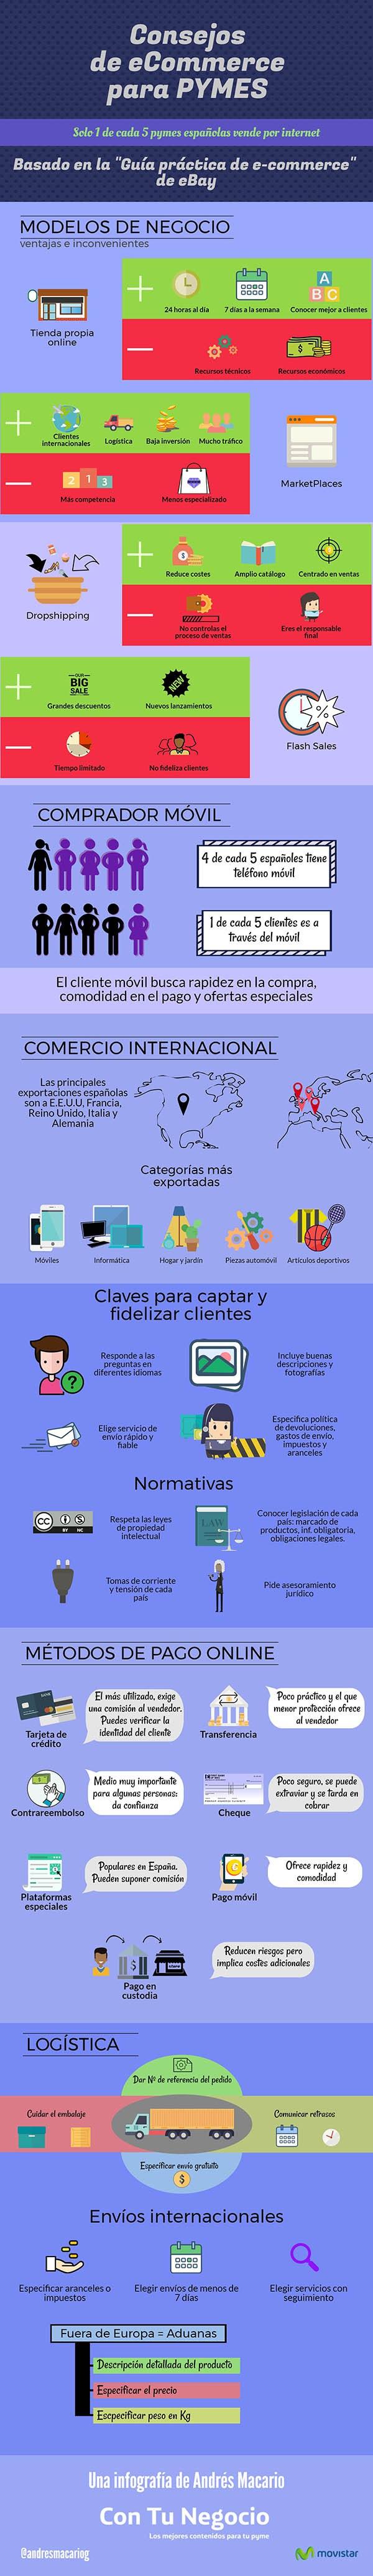 Consejos de eCommerce para pymes #infografia @andresmacariog